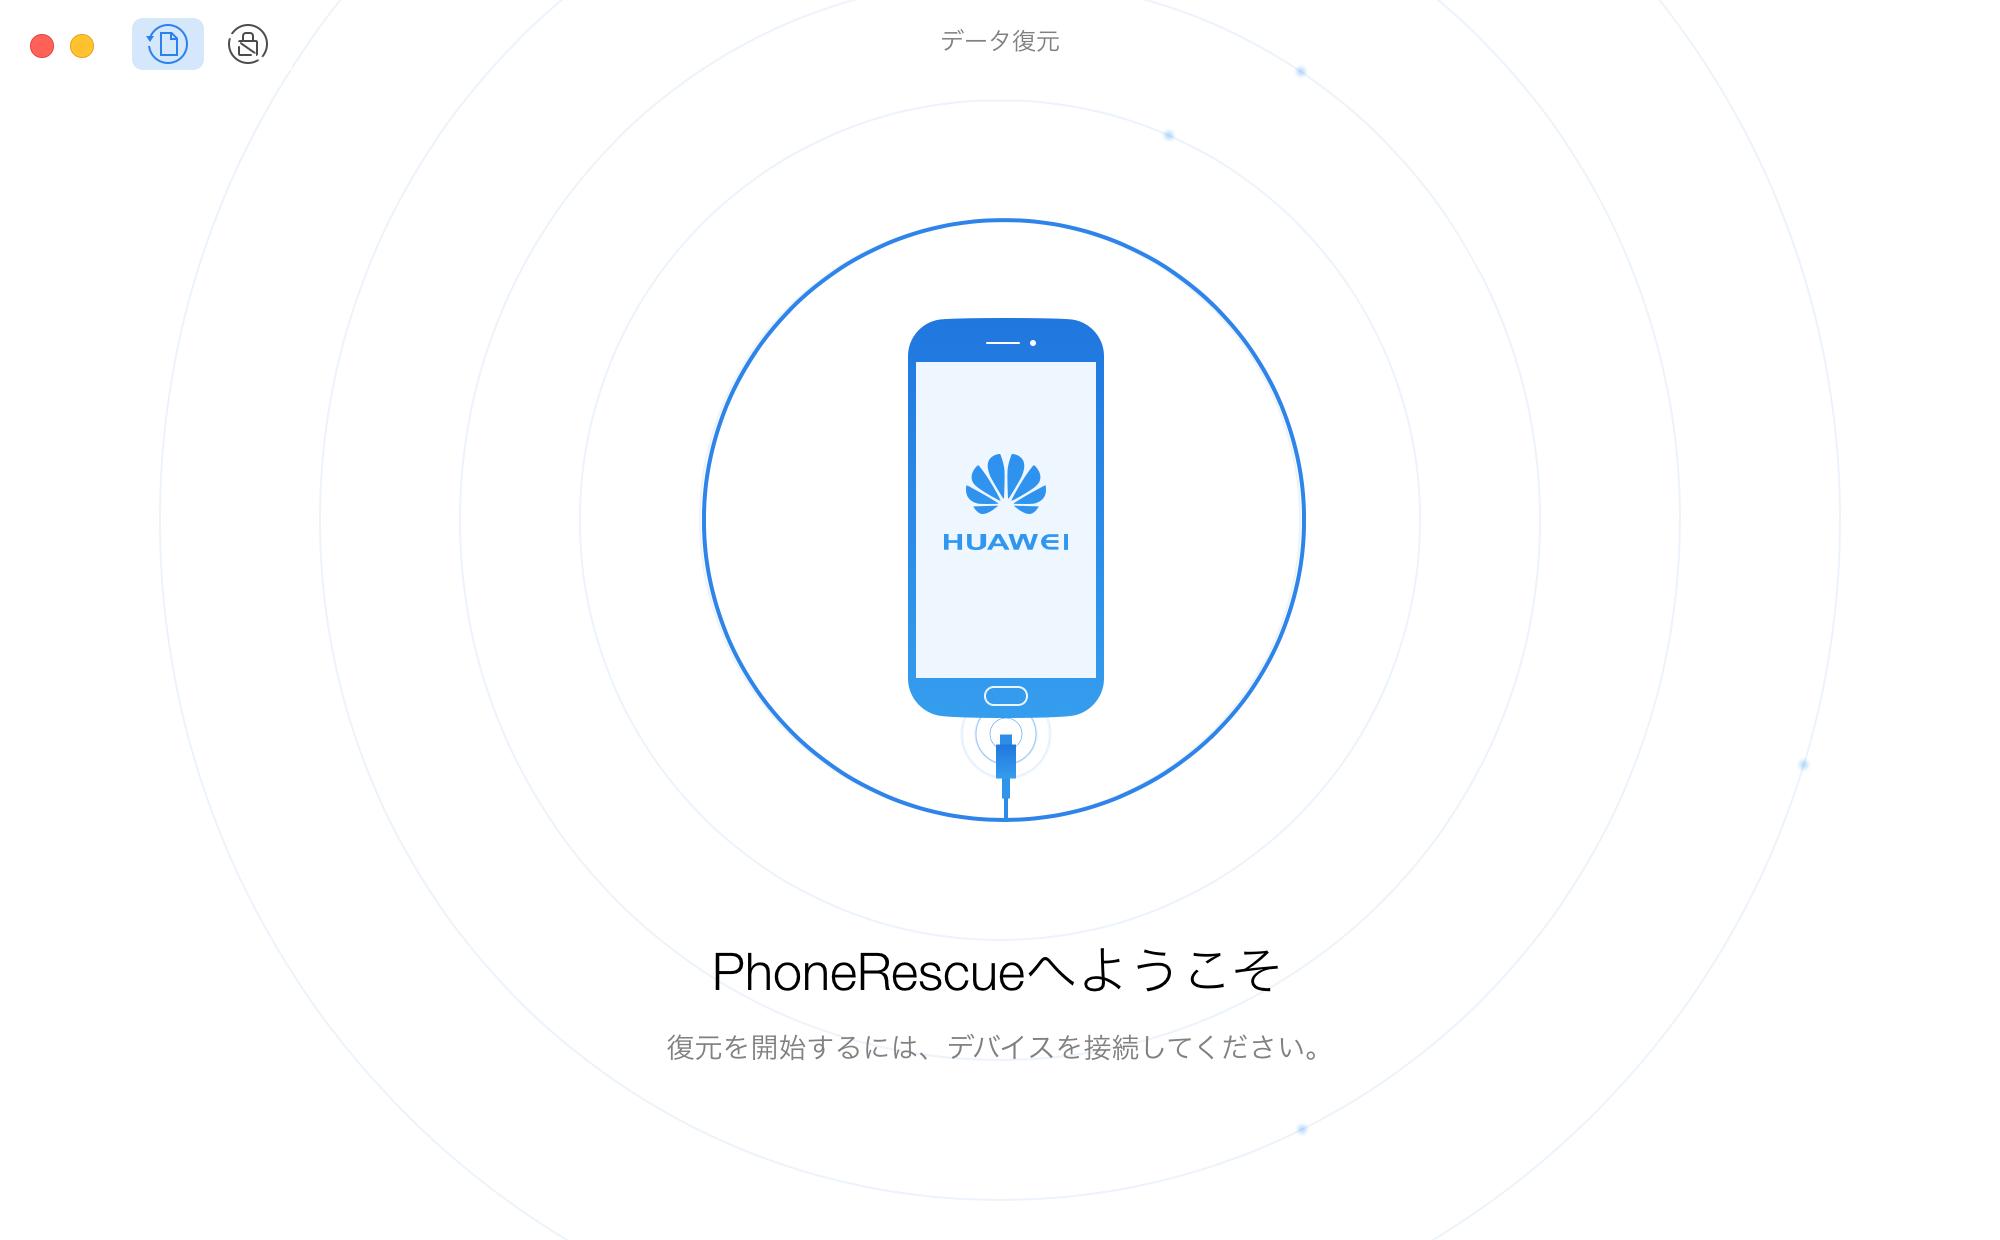 PhoneRescue - HUAWEIデータ復元のウェルカムページ